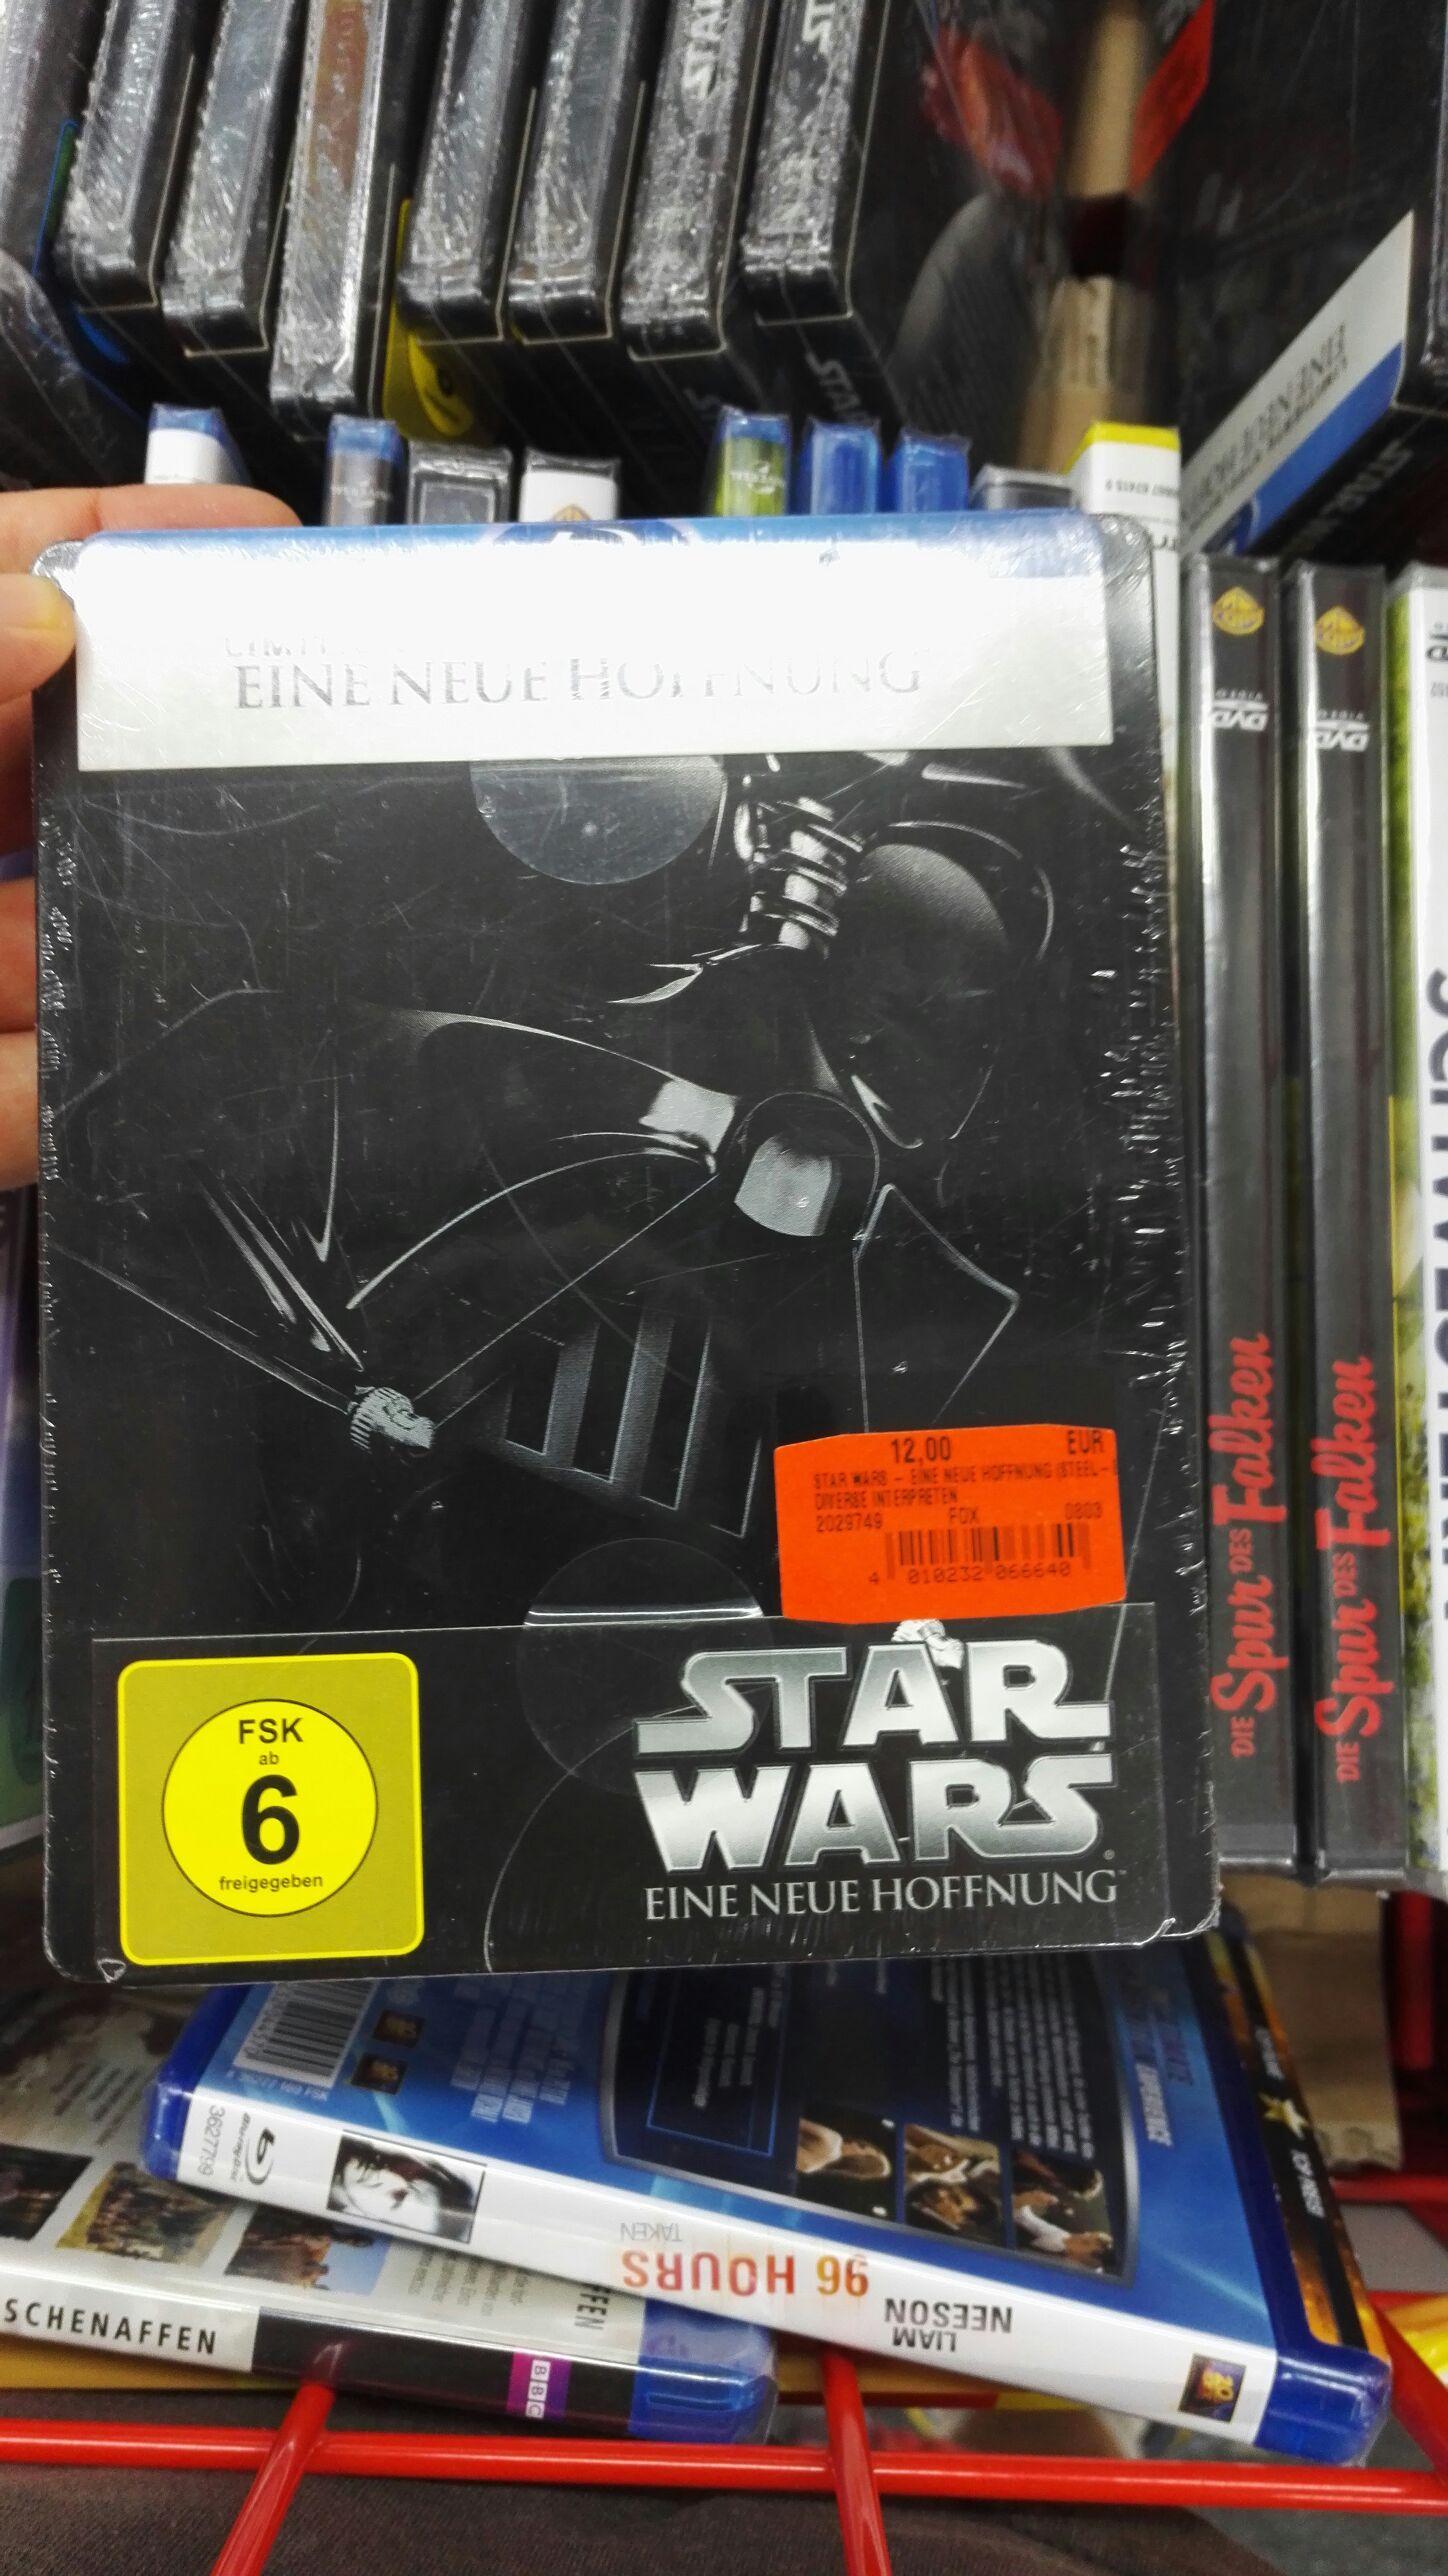 Star Wars Episode II bis IV Blu-ray Steelbook [lokal LB Breuningerland]